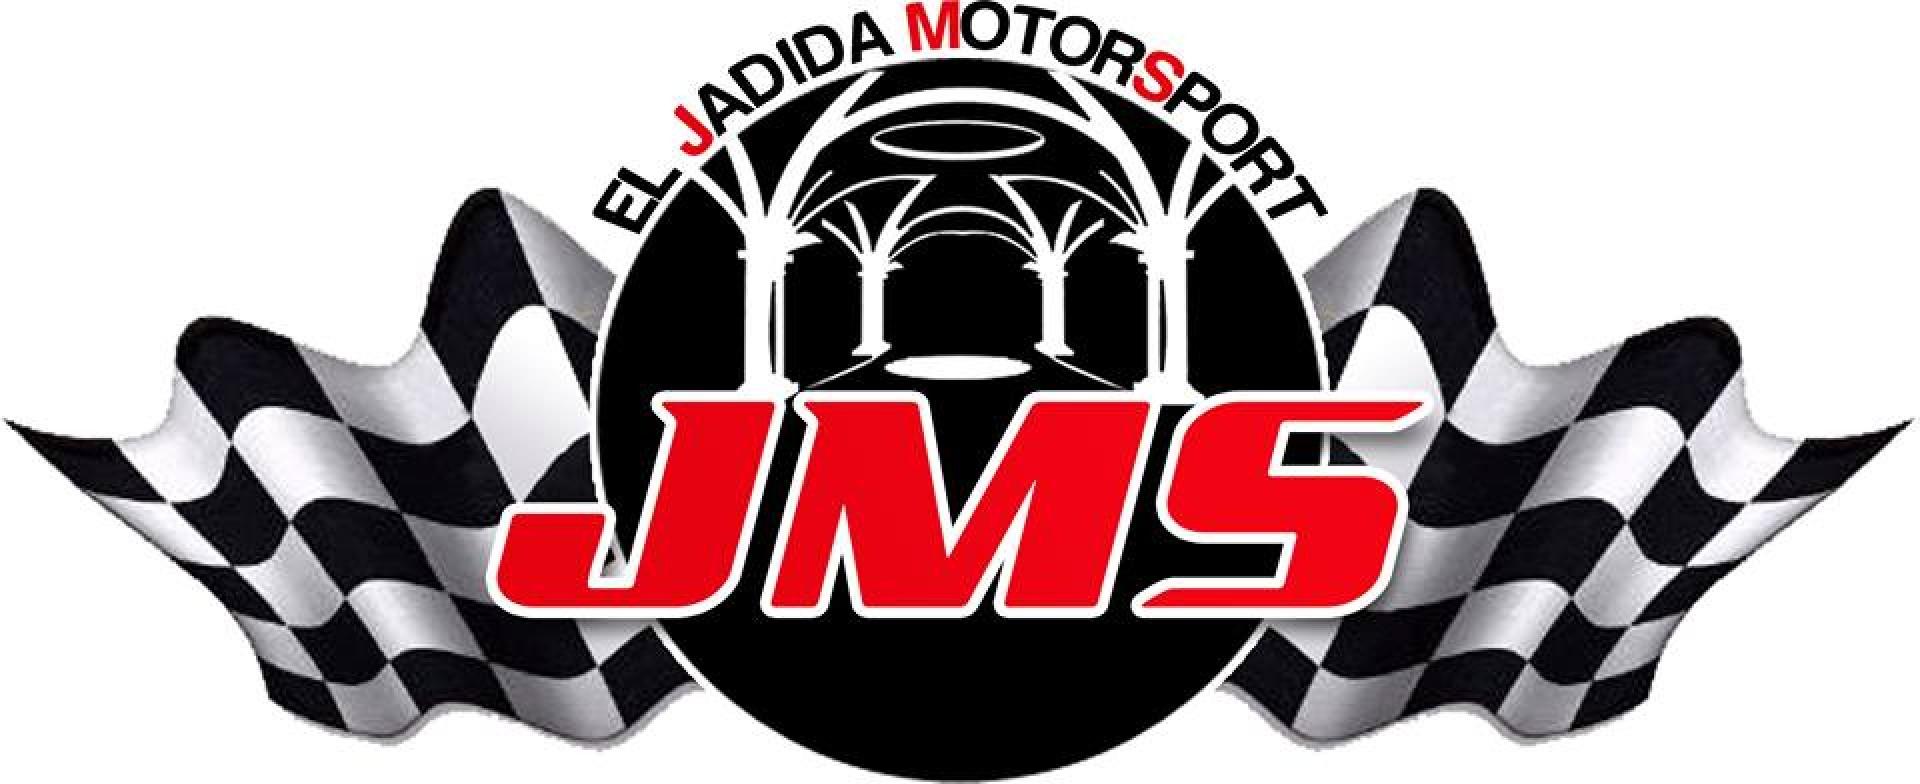 El Jadida MotorSport (JMS) logo